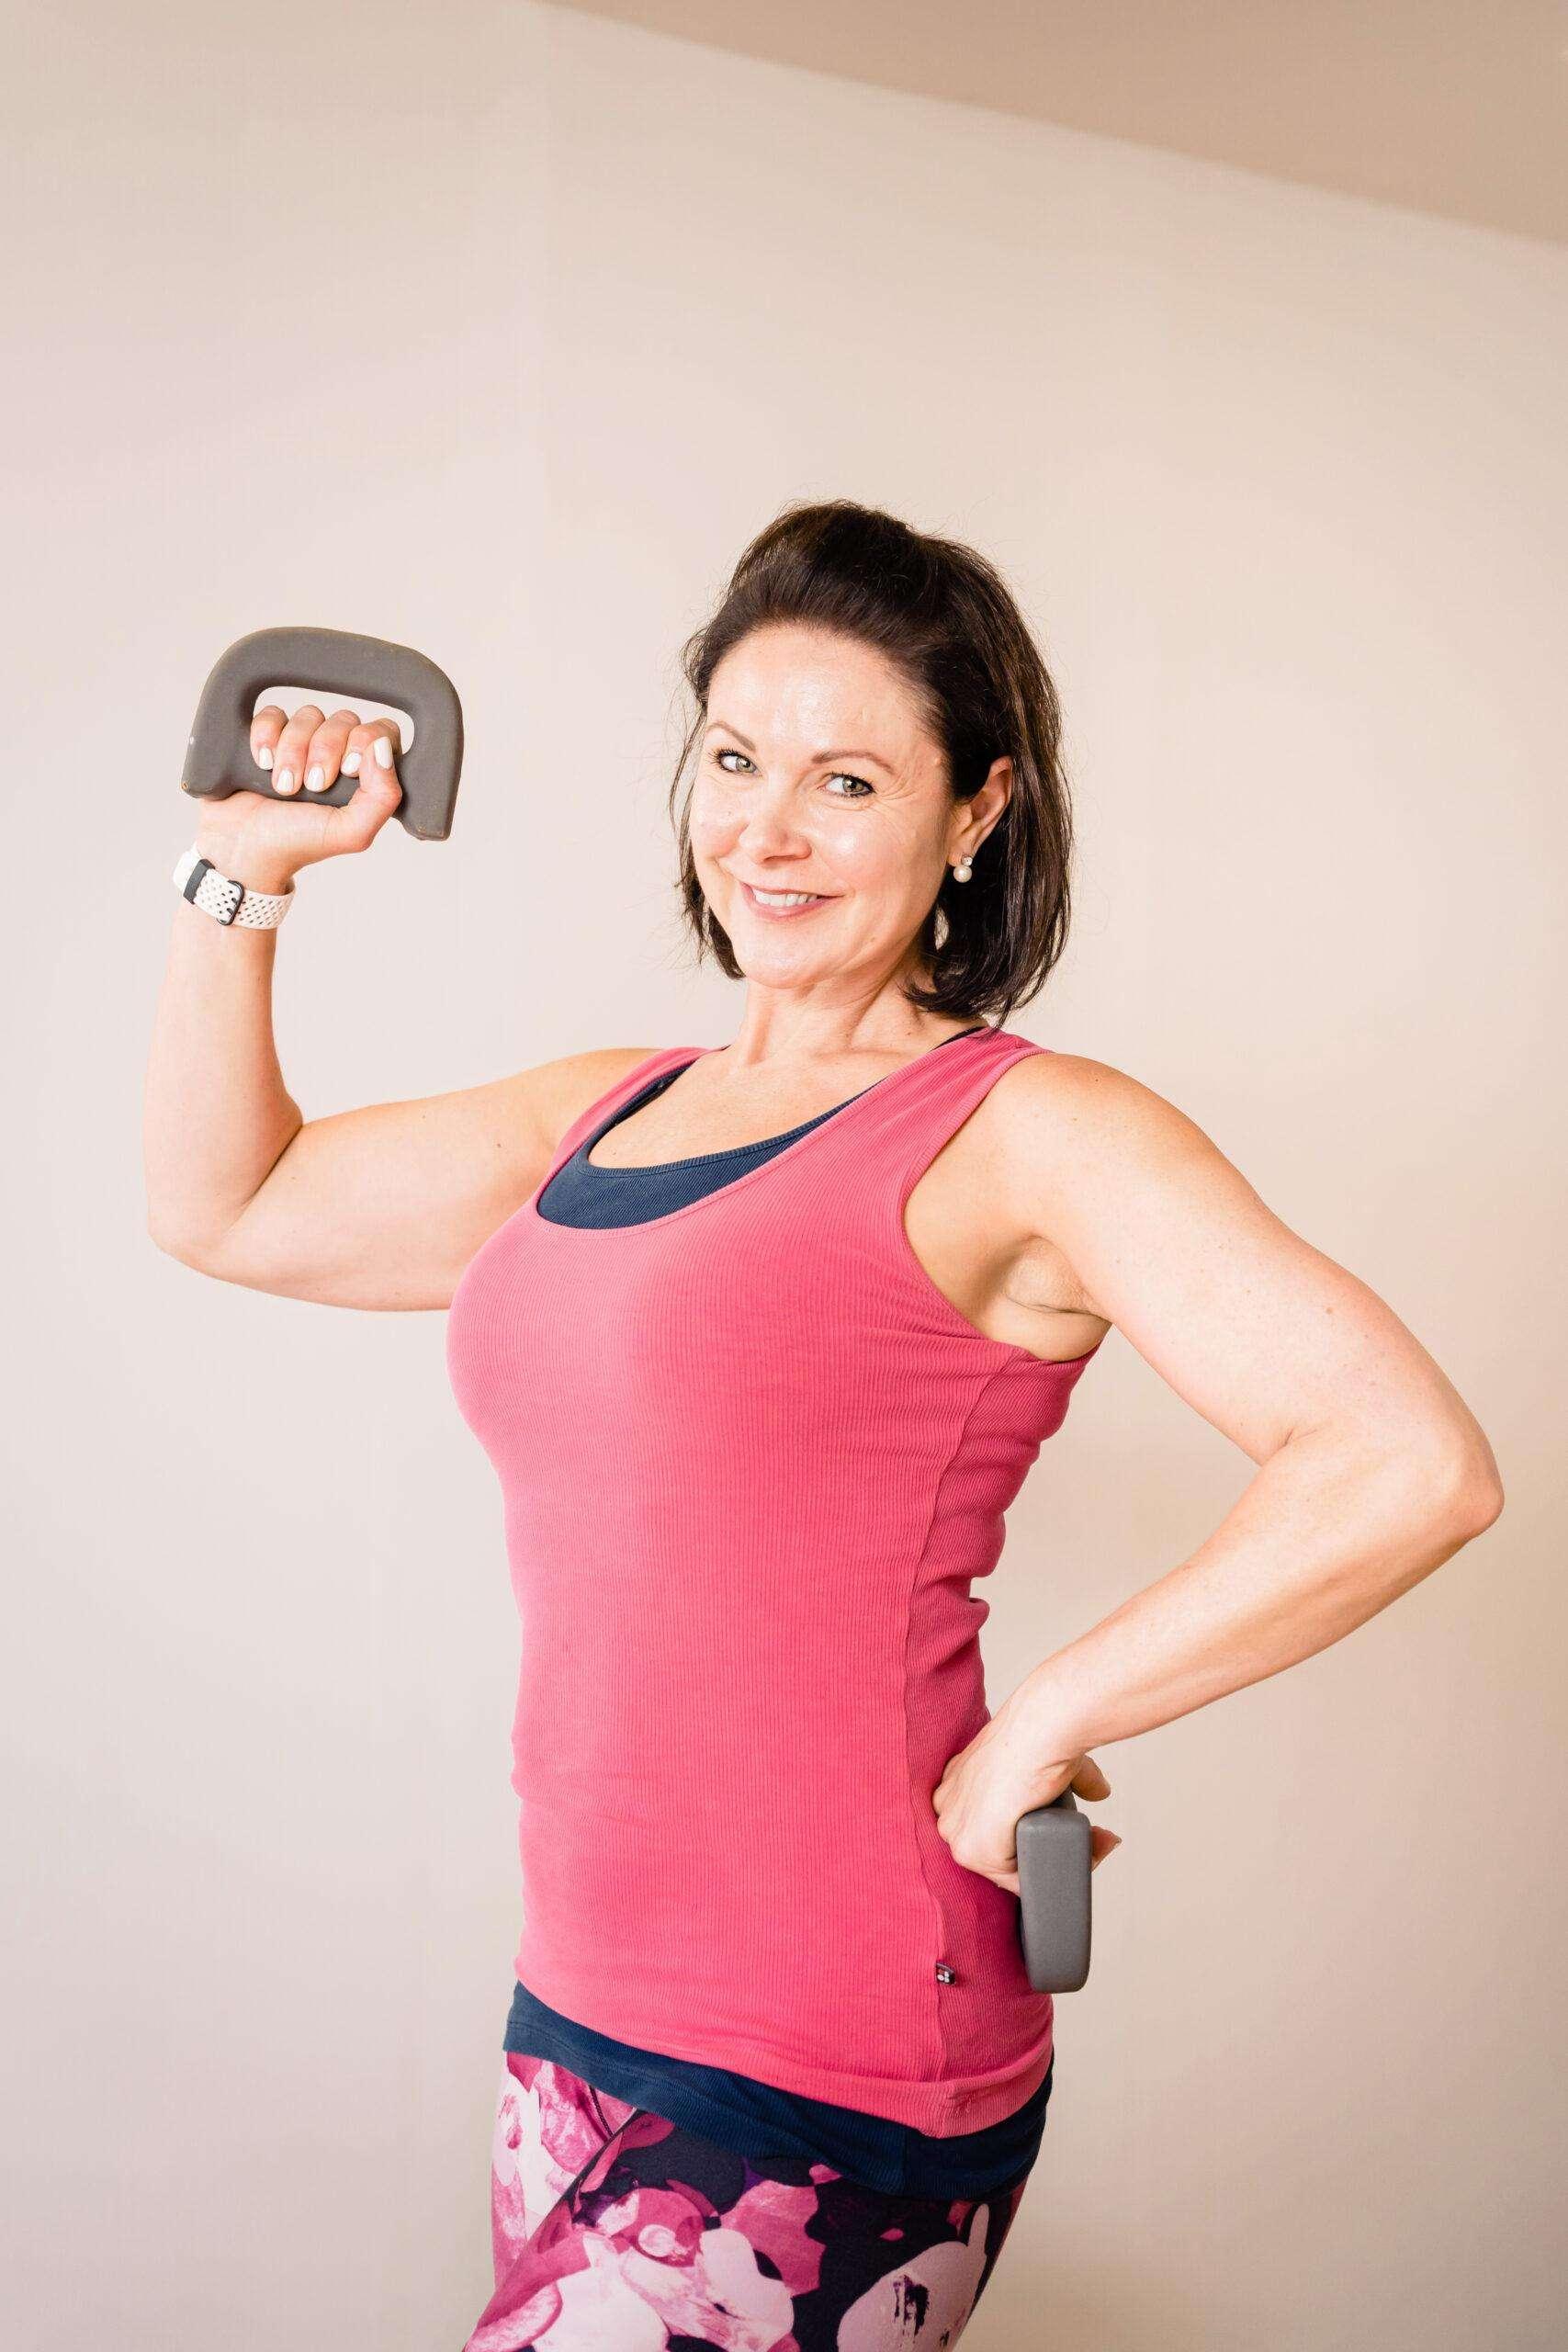 0nline fitness pilates cardio hiit cardio boxing vikki davis fitness